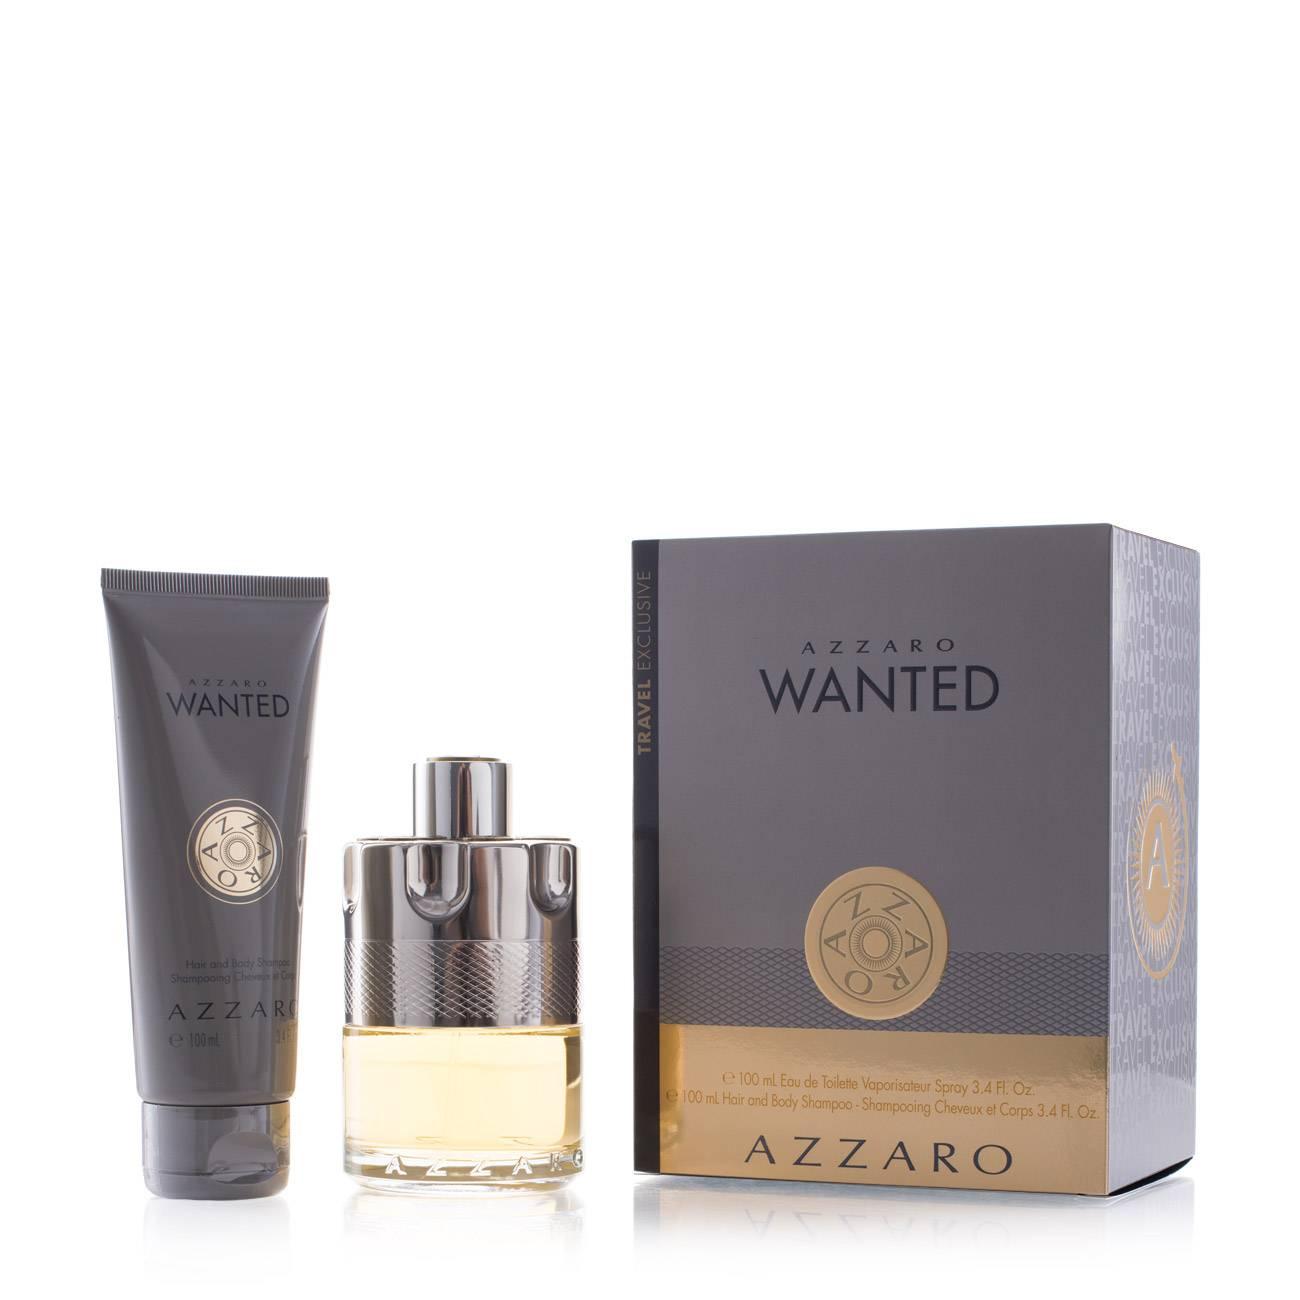 AZZARO WANTED 200ml